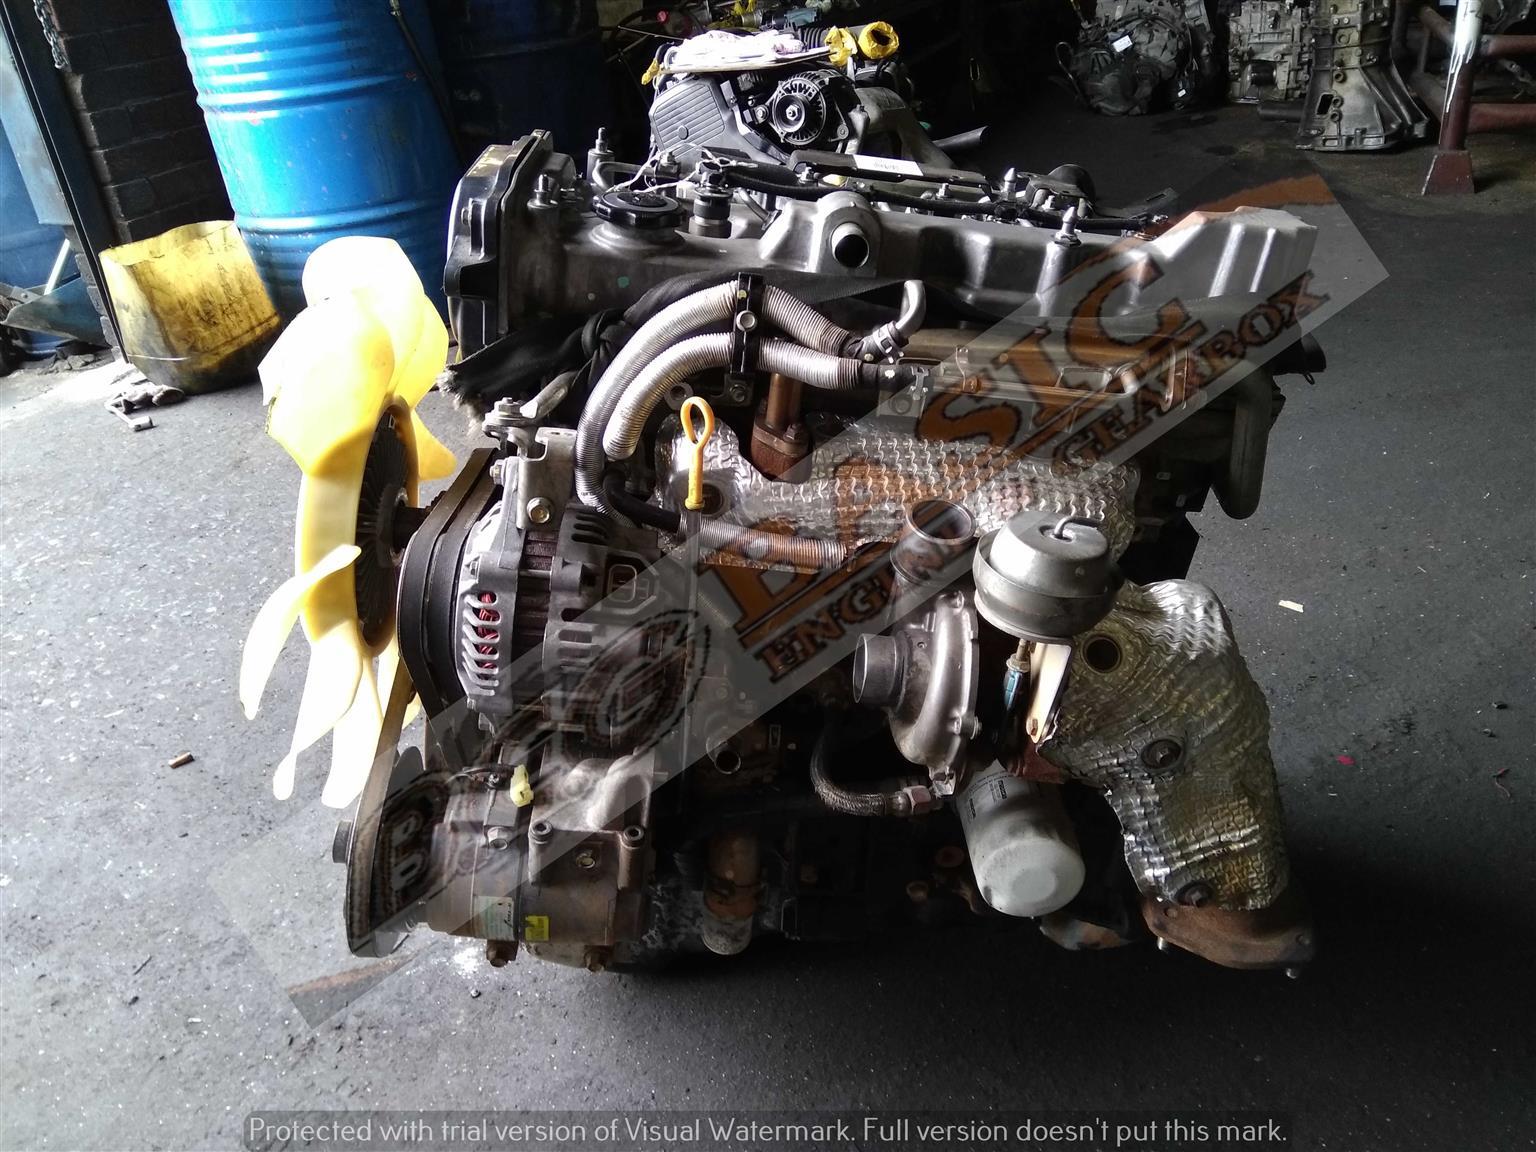 FORD RANGER -WEAT / BT50 3.0L TURBO DIESEL EFI Engine